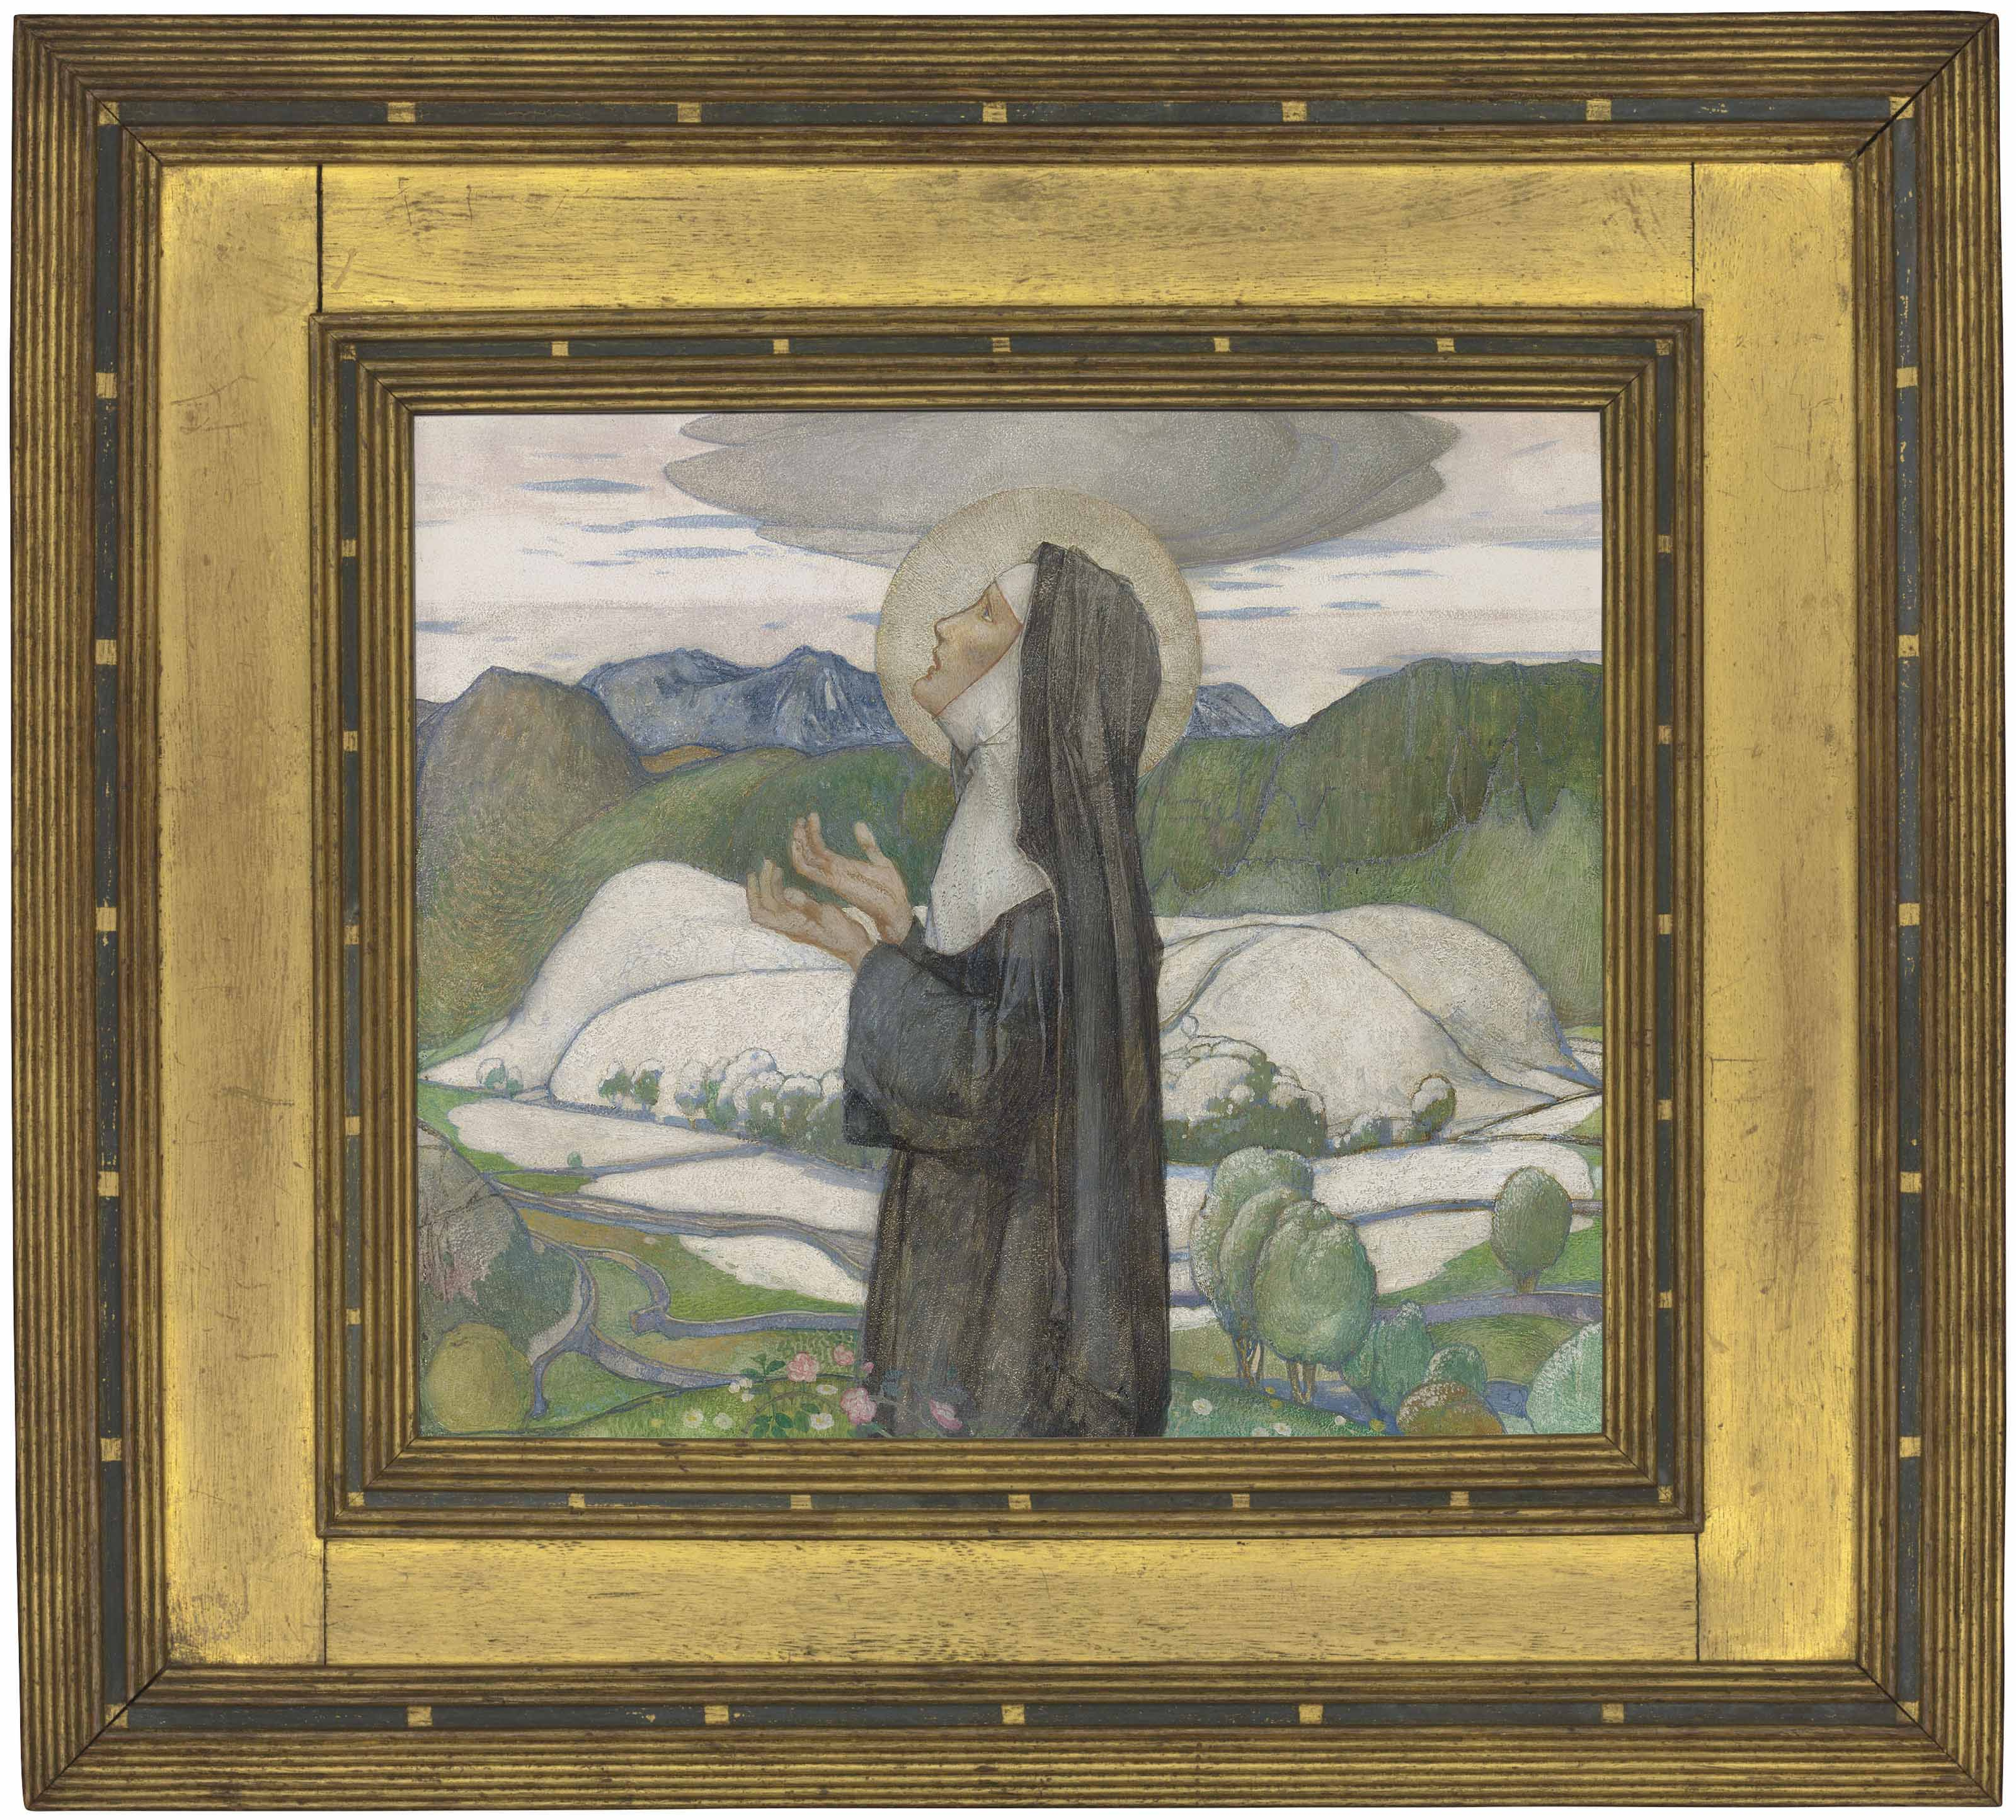 A female saint, possibly St Bega of Cumbria